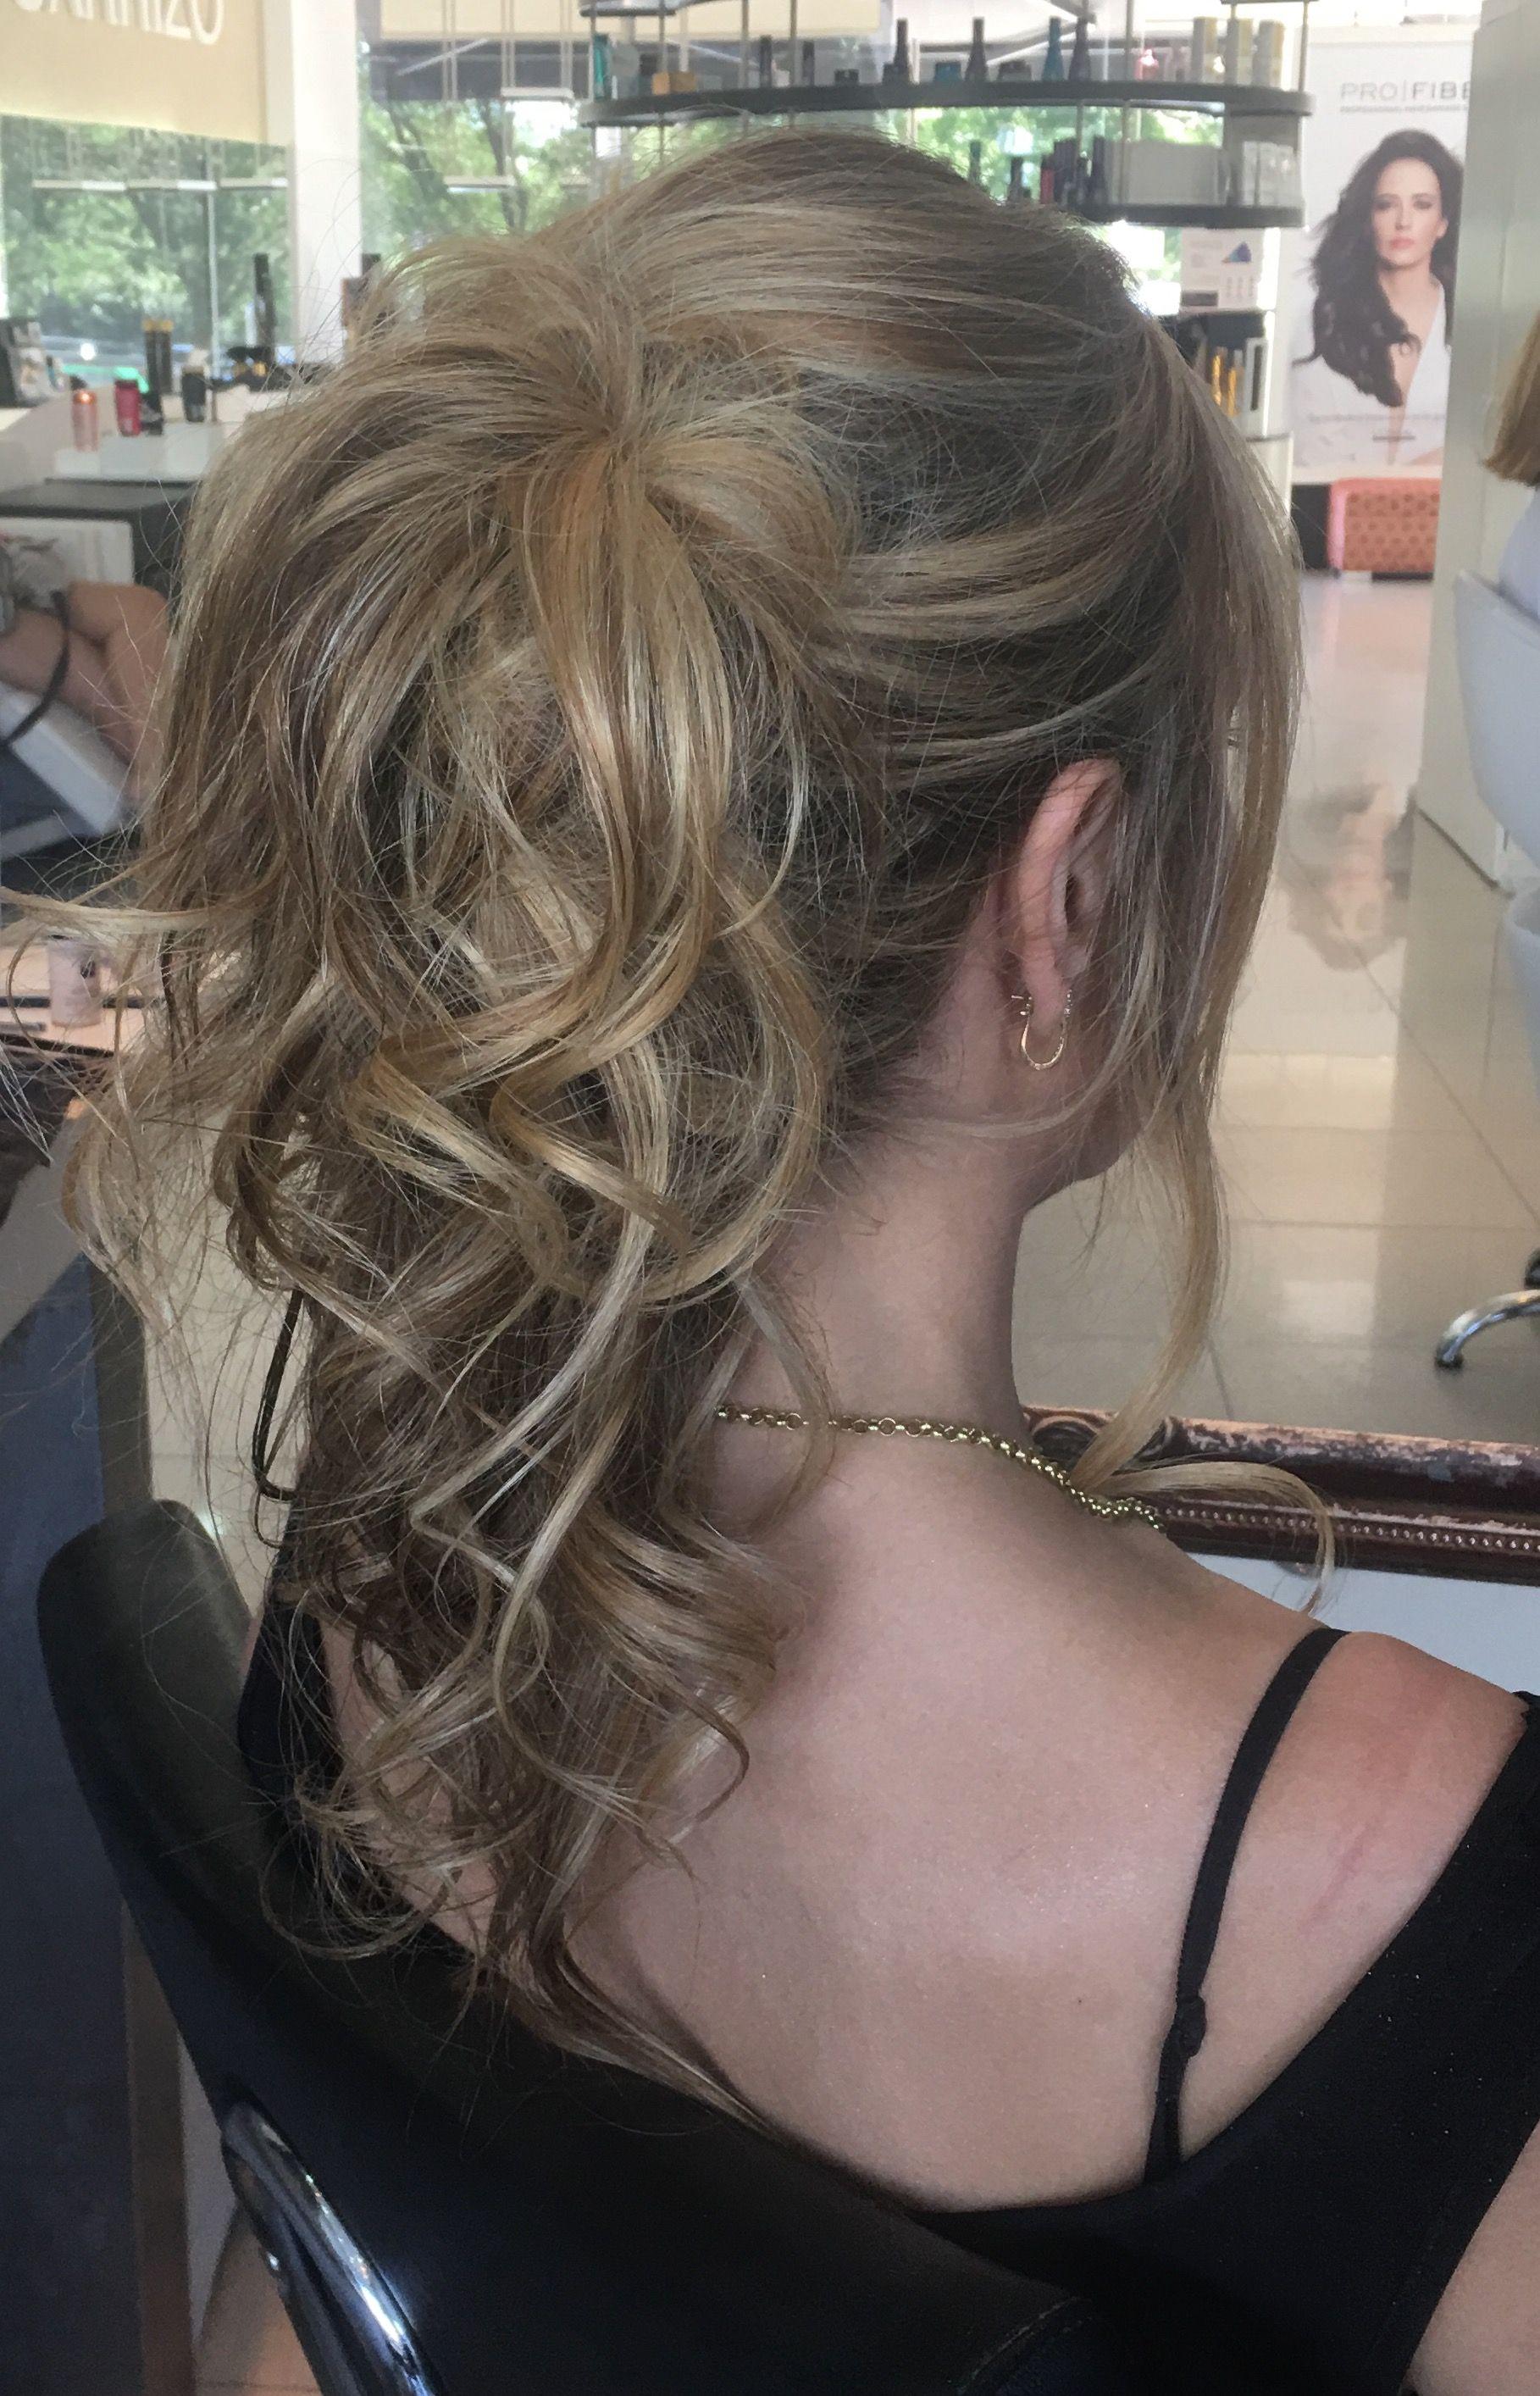 Peinado Semi Recogido Recogido Pelo Largo Peinados Pelo Largo Peinados Con Coleta